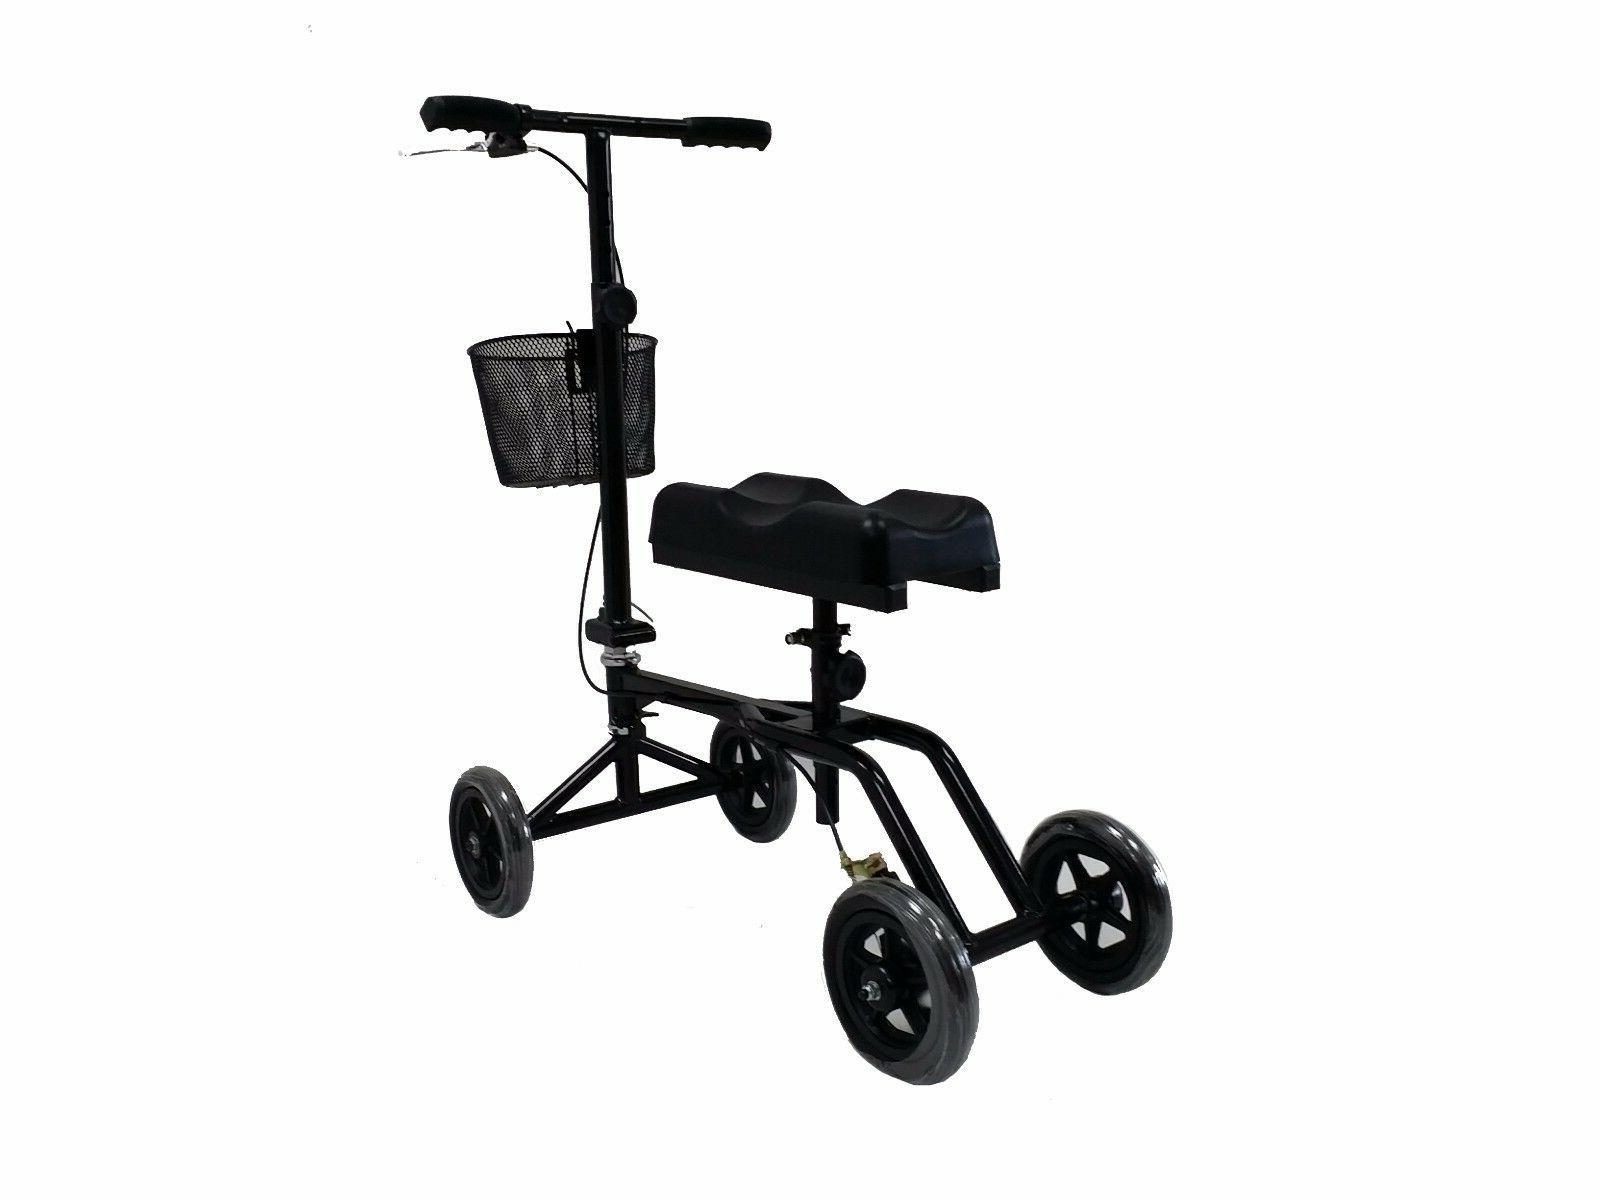 New Black Knee Scooter Brake Basket Drive